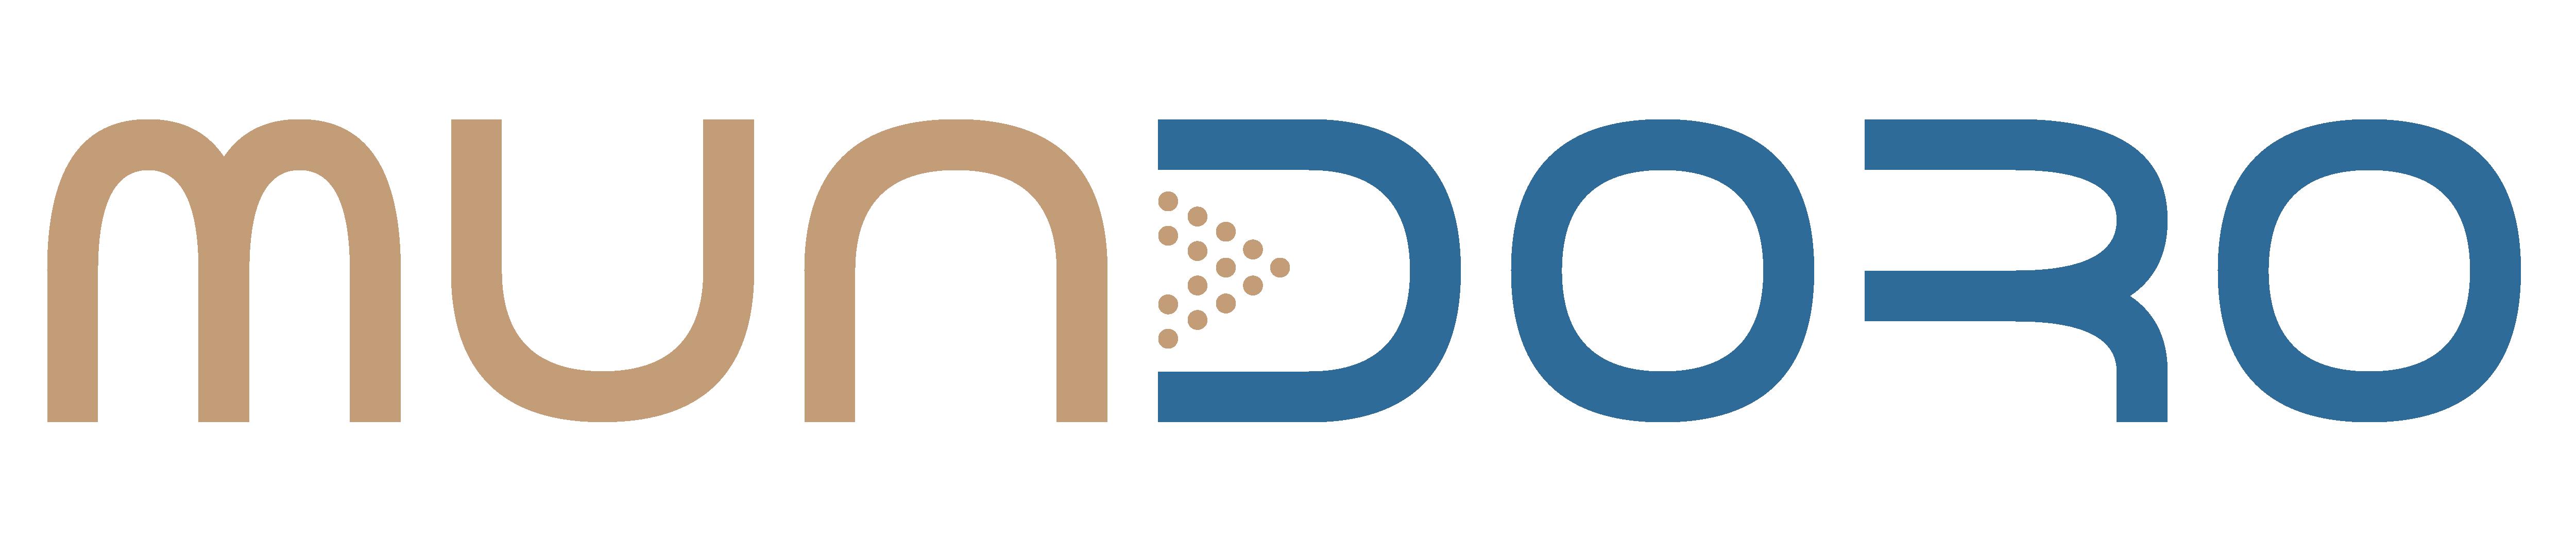 Mundoro Capital Inc